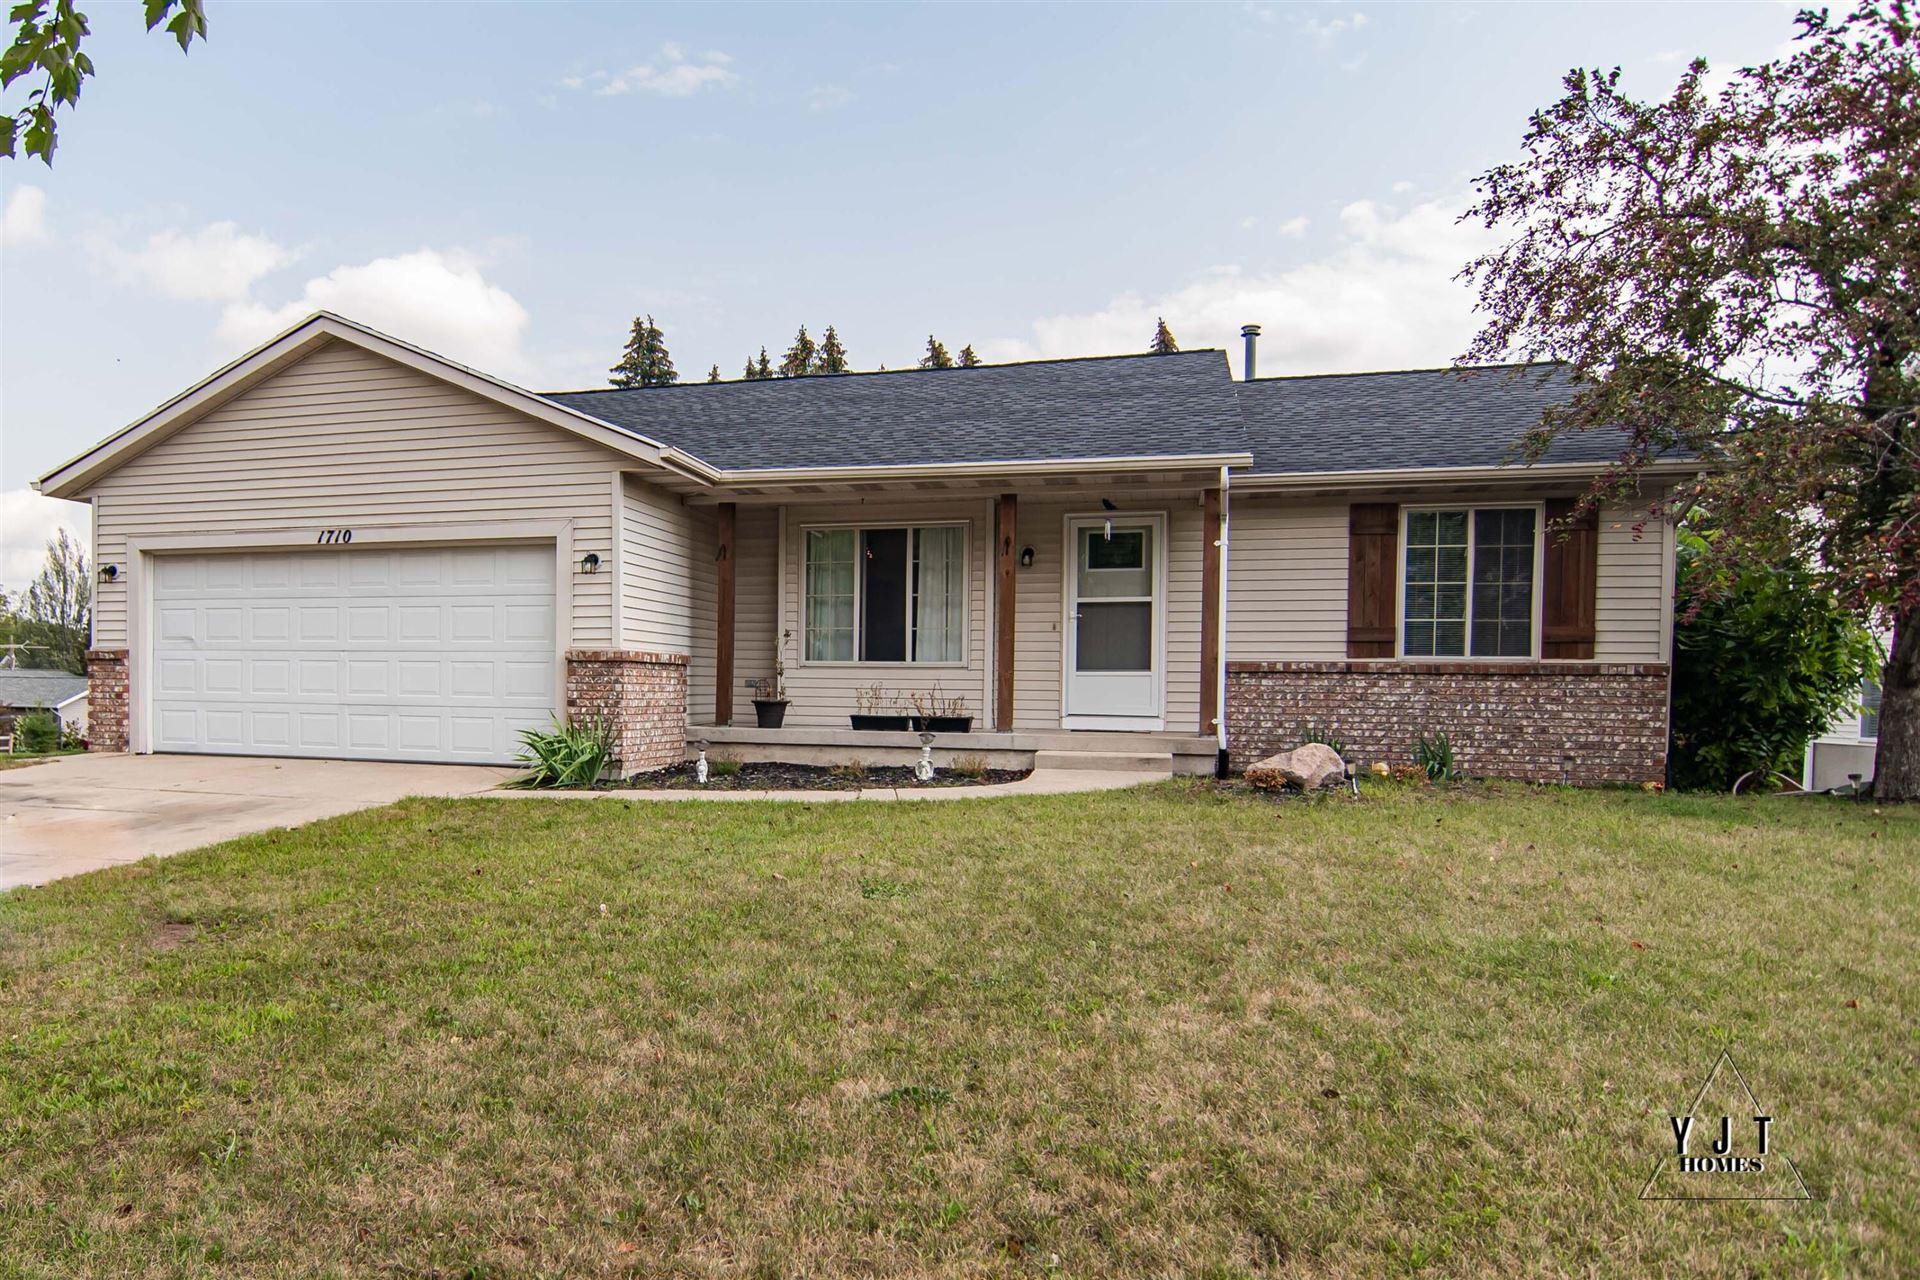 1710 Edith NE, Grand Rapids, MI 49505 - MLS#: 21106070